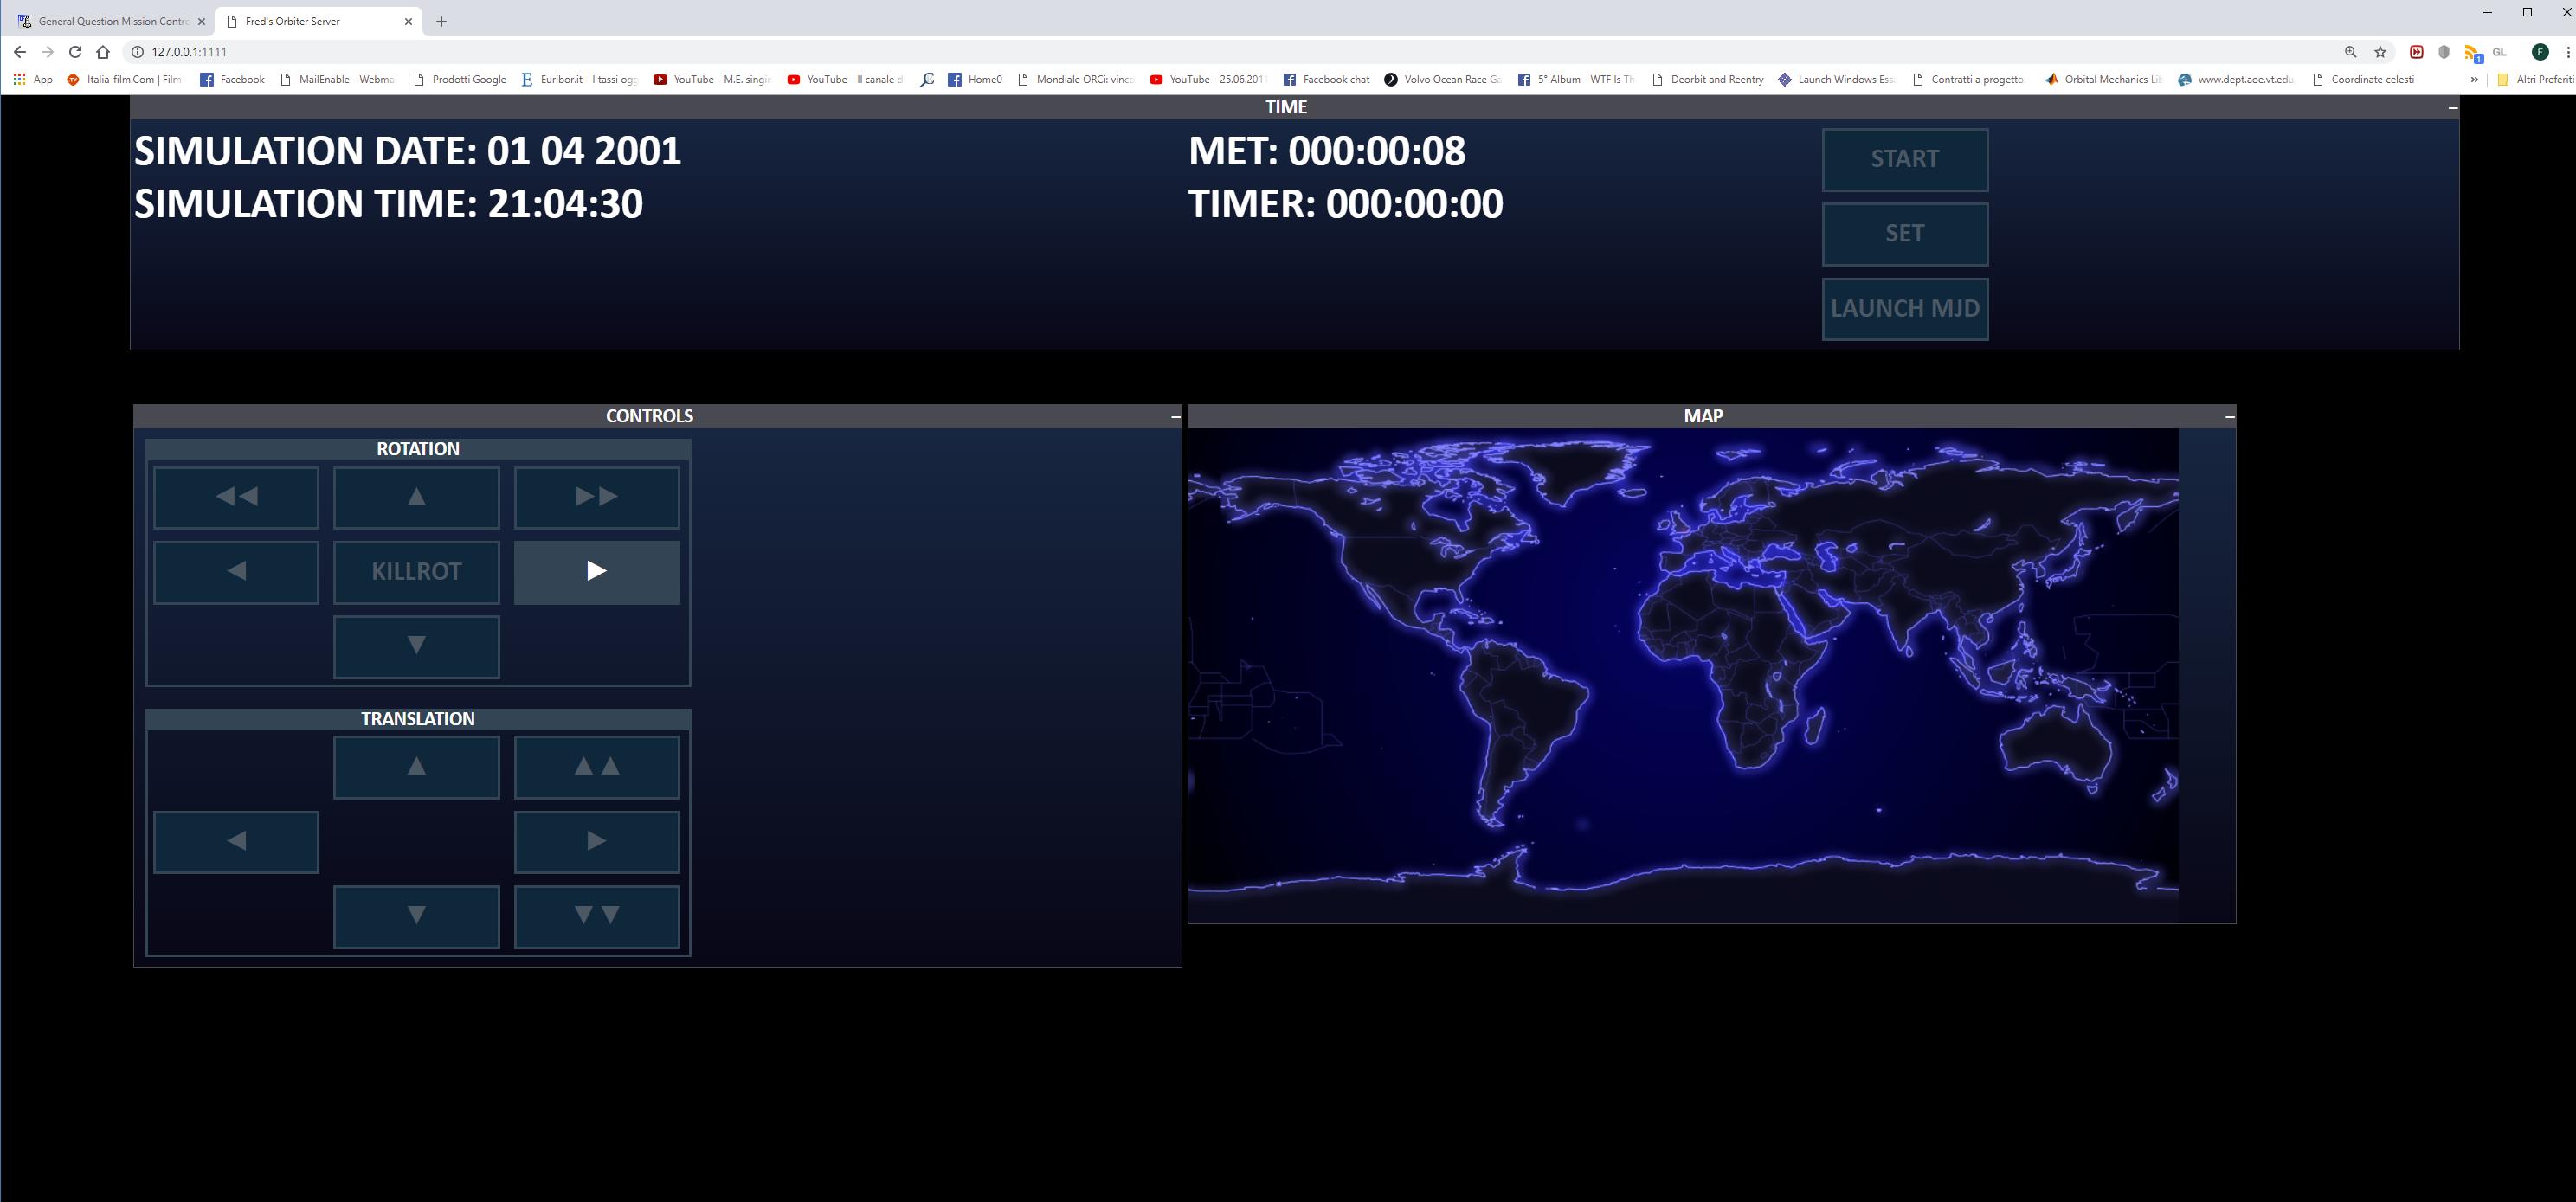 Orbiter%20webMCC.png